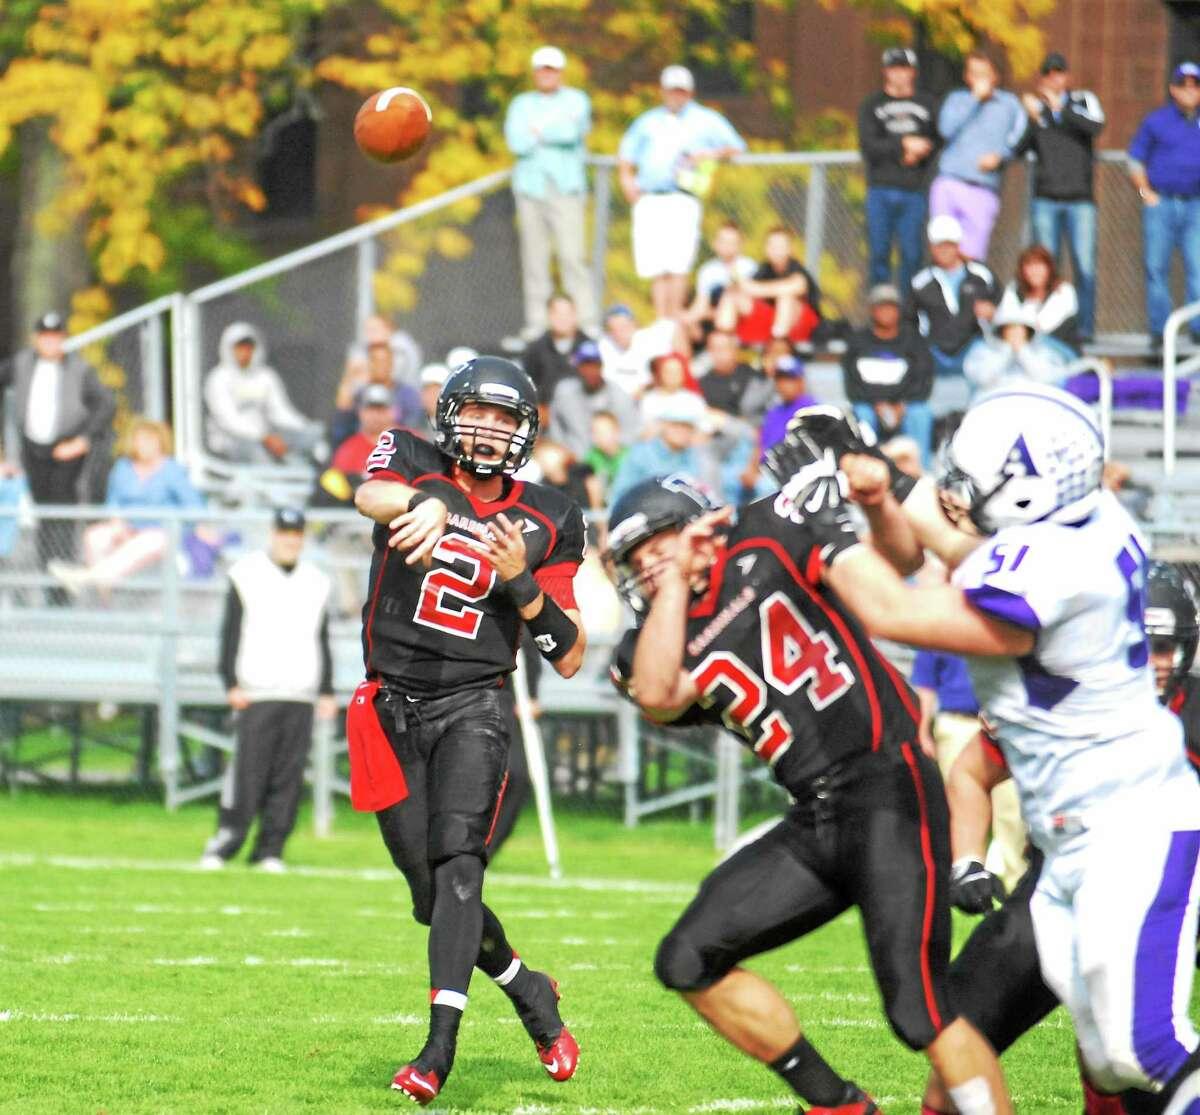 Wesleyan senior quarterback Jesse Warren fires a pass against Little Three rival Amherst last Saturday on Andrus Field.